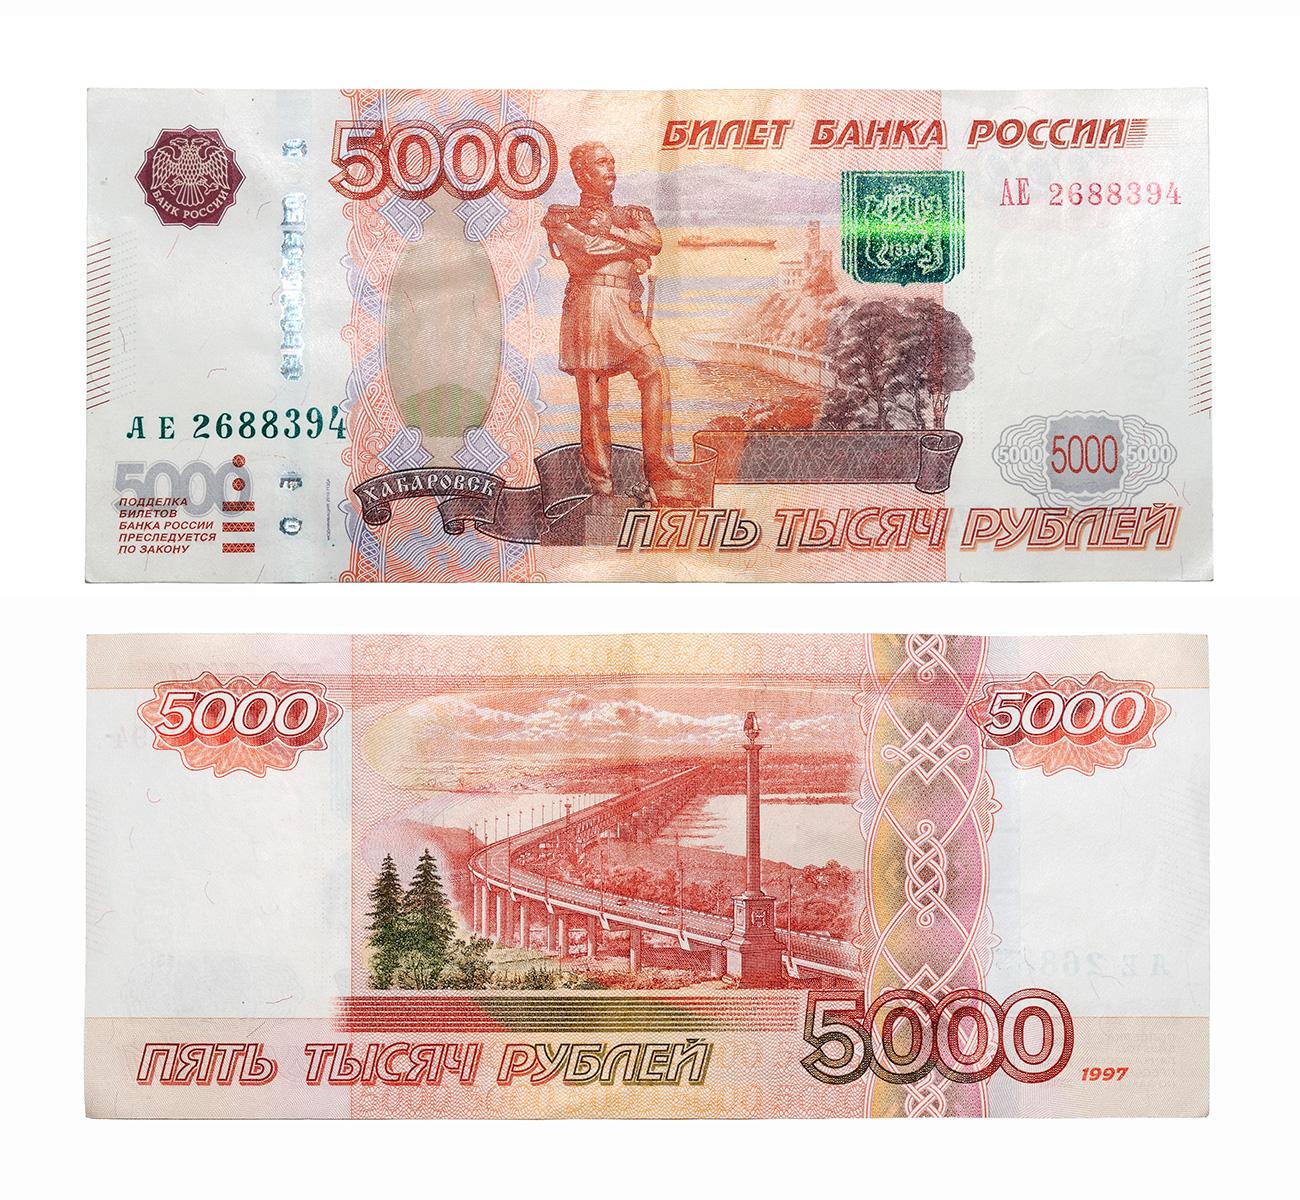 5000 rubles / Global Look Press